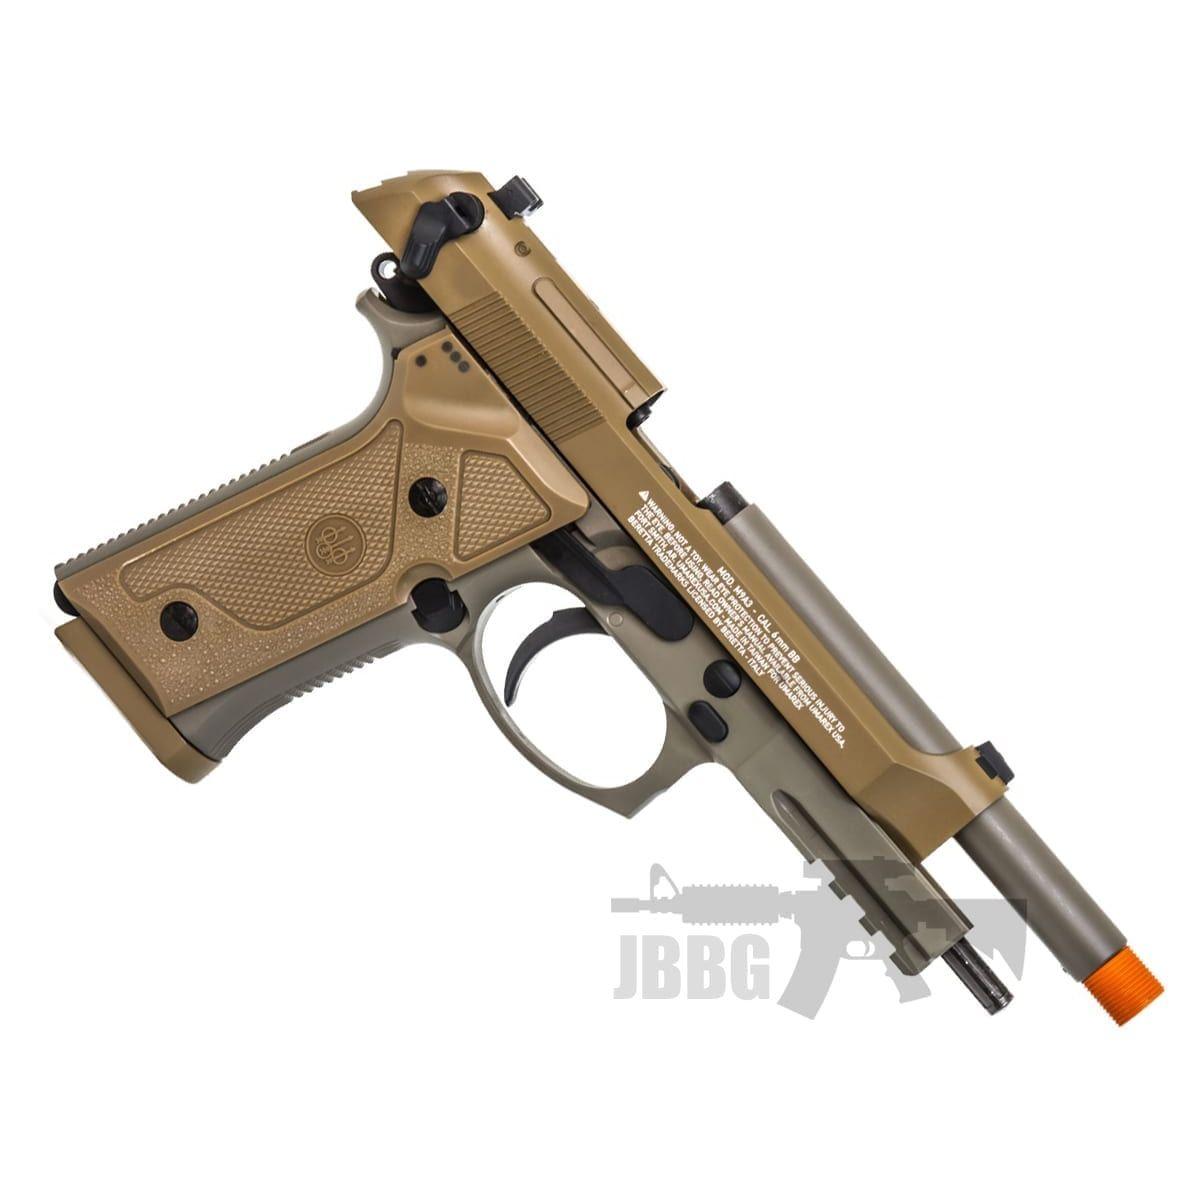 baretta-co2-pistol-gas-tan-gun